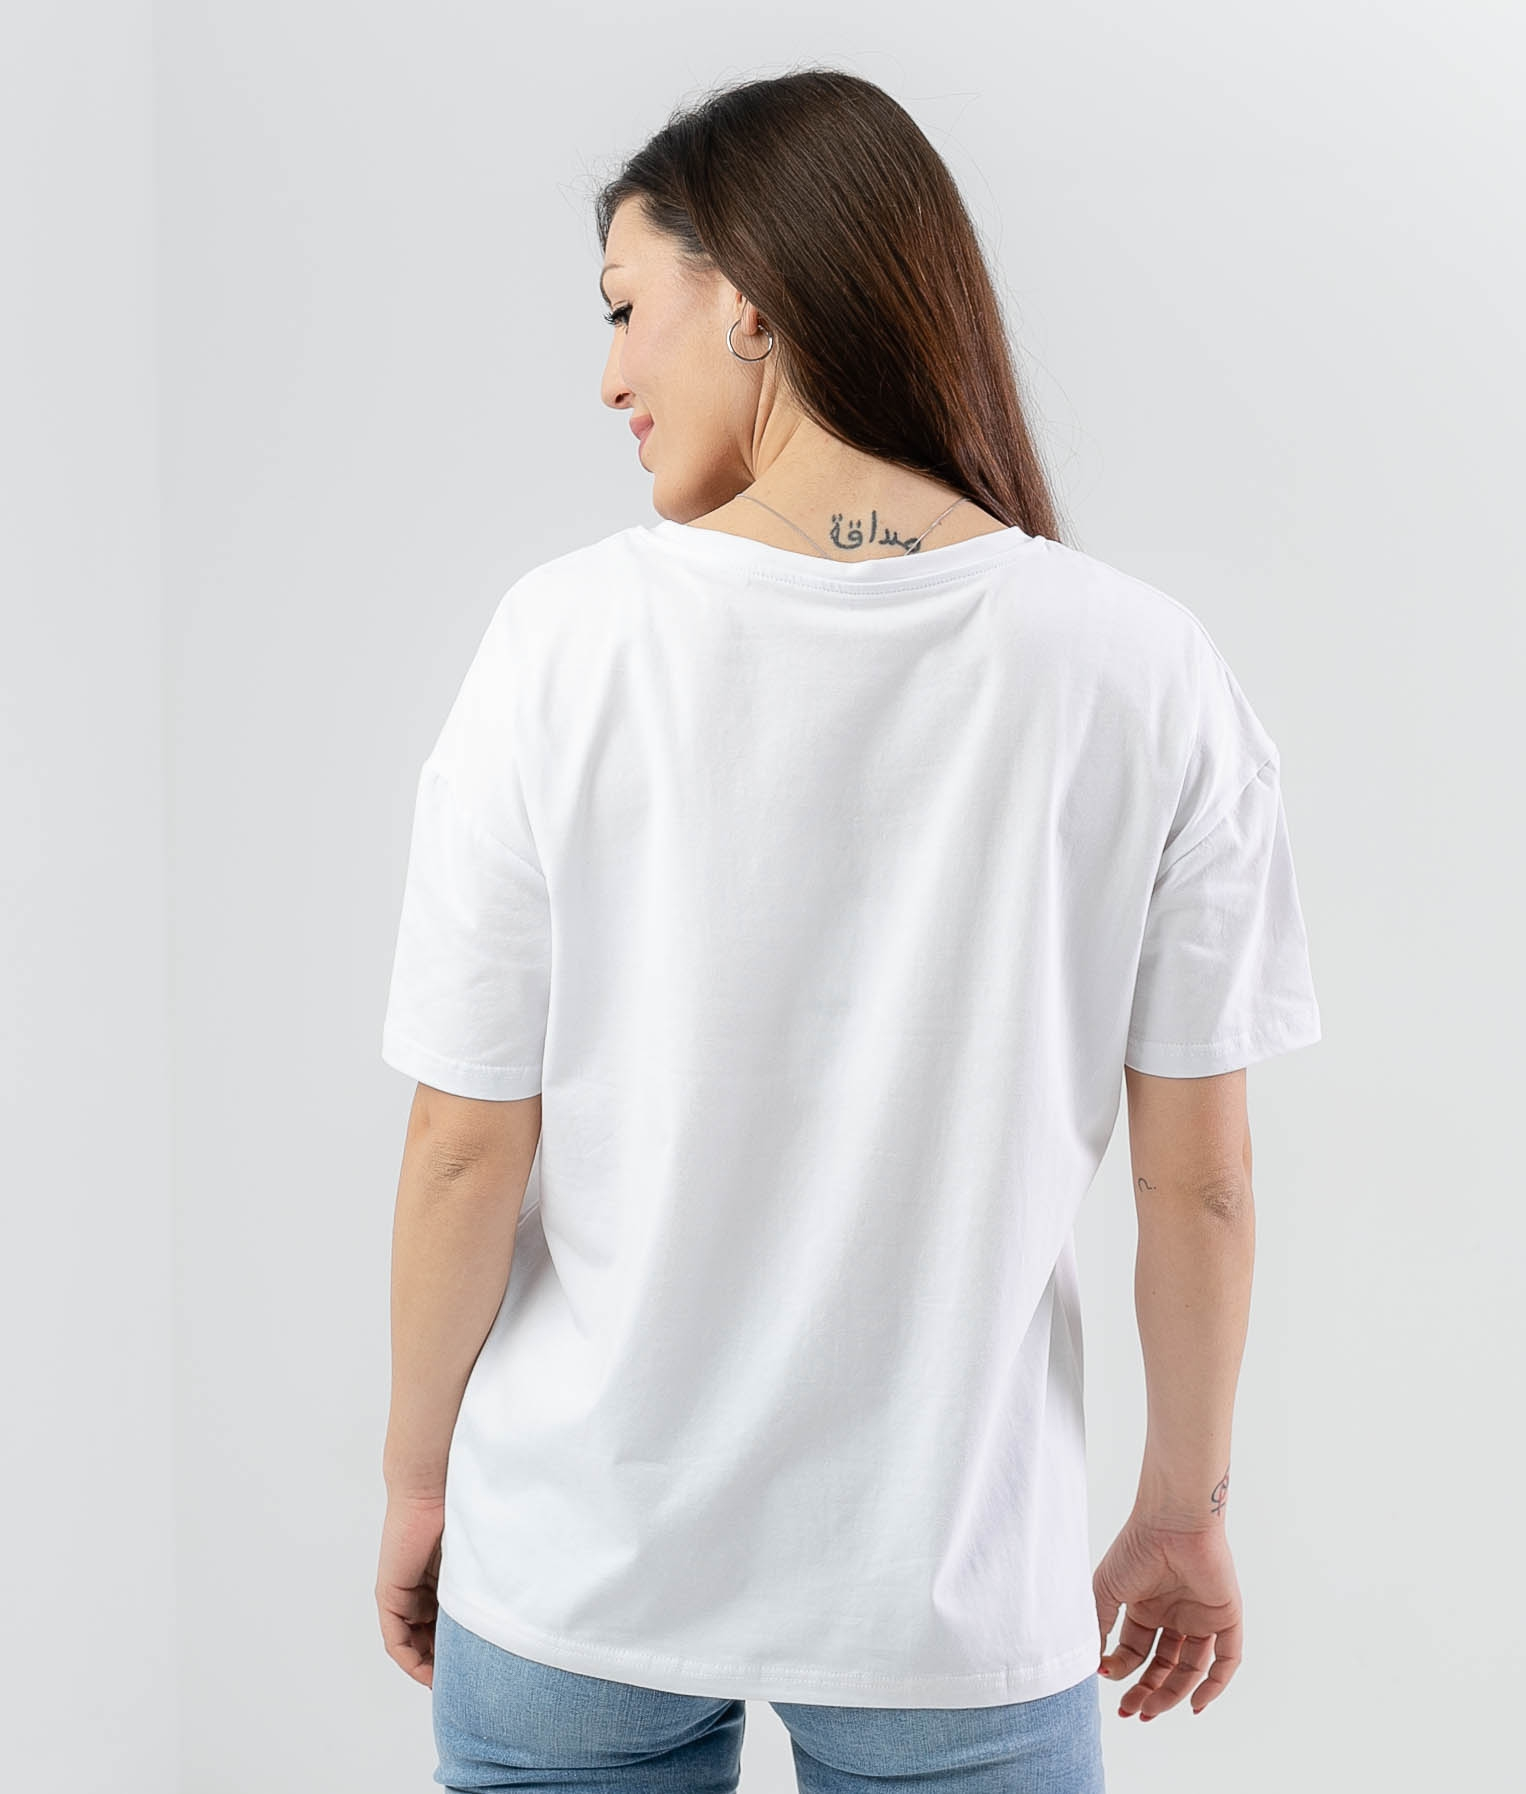 T-shirt Bademi - Blanc